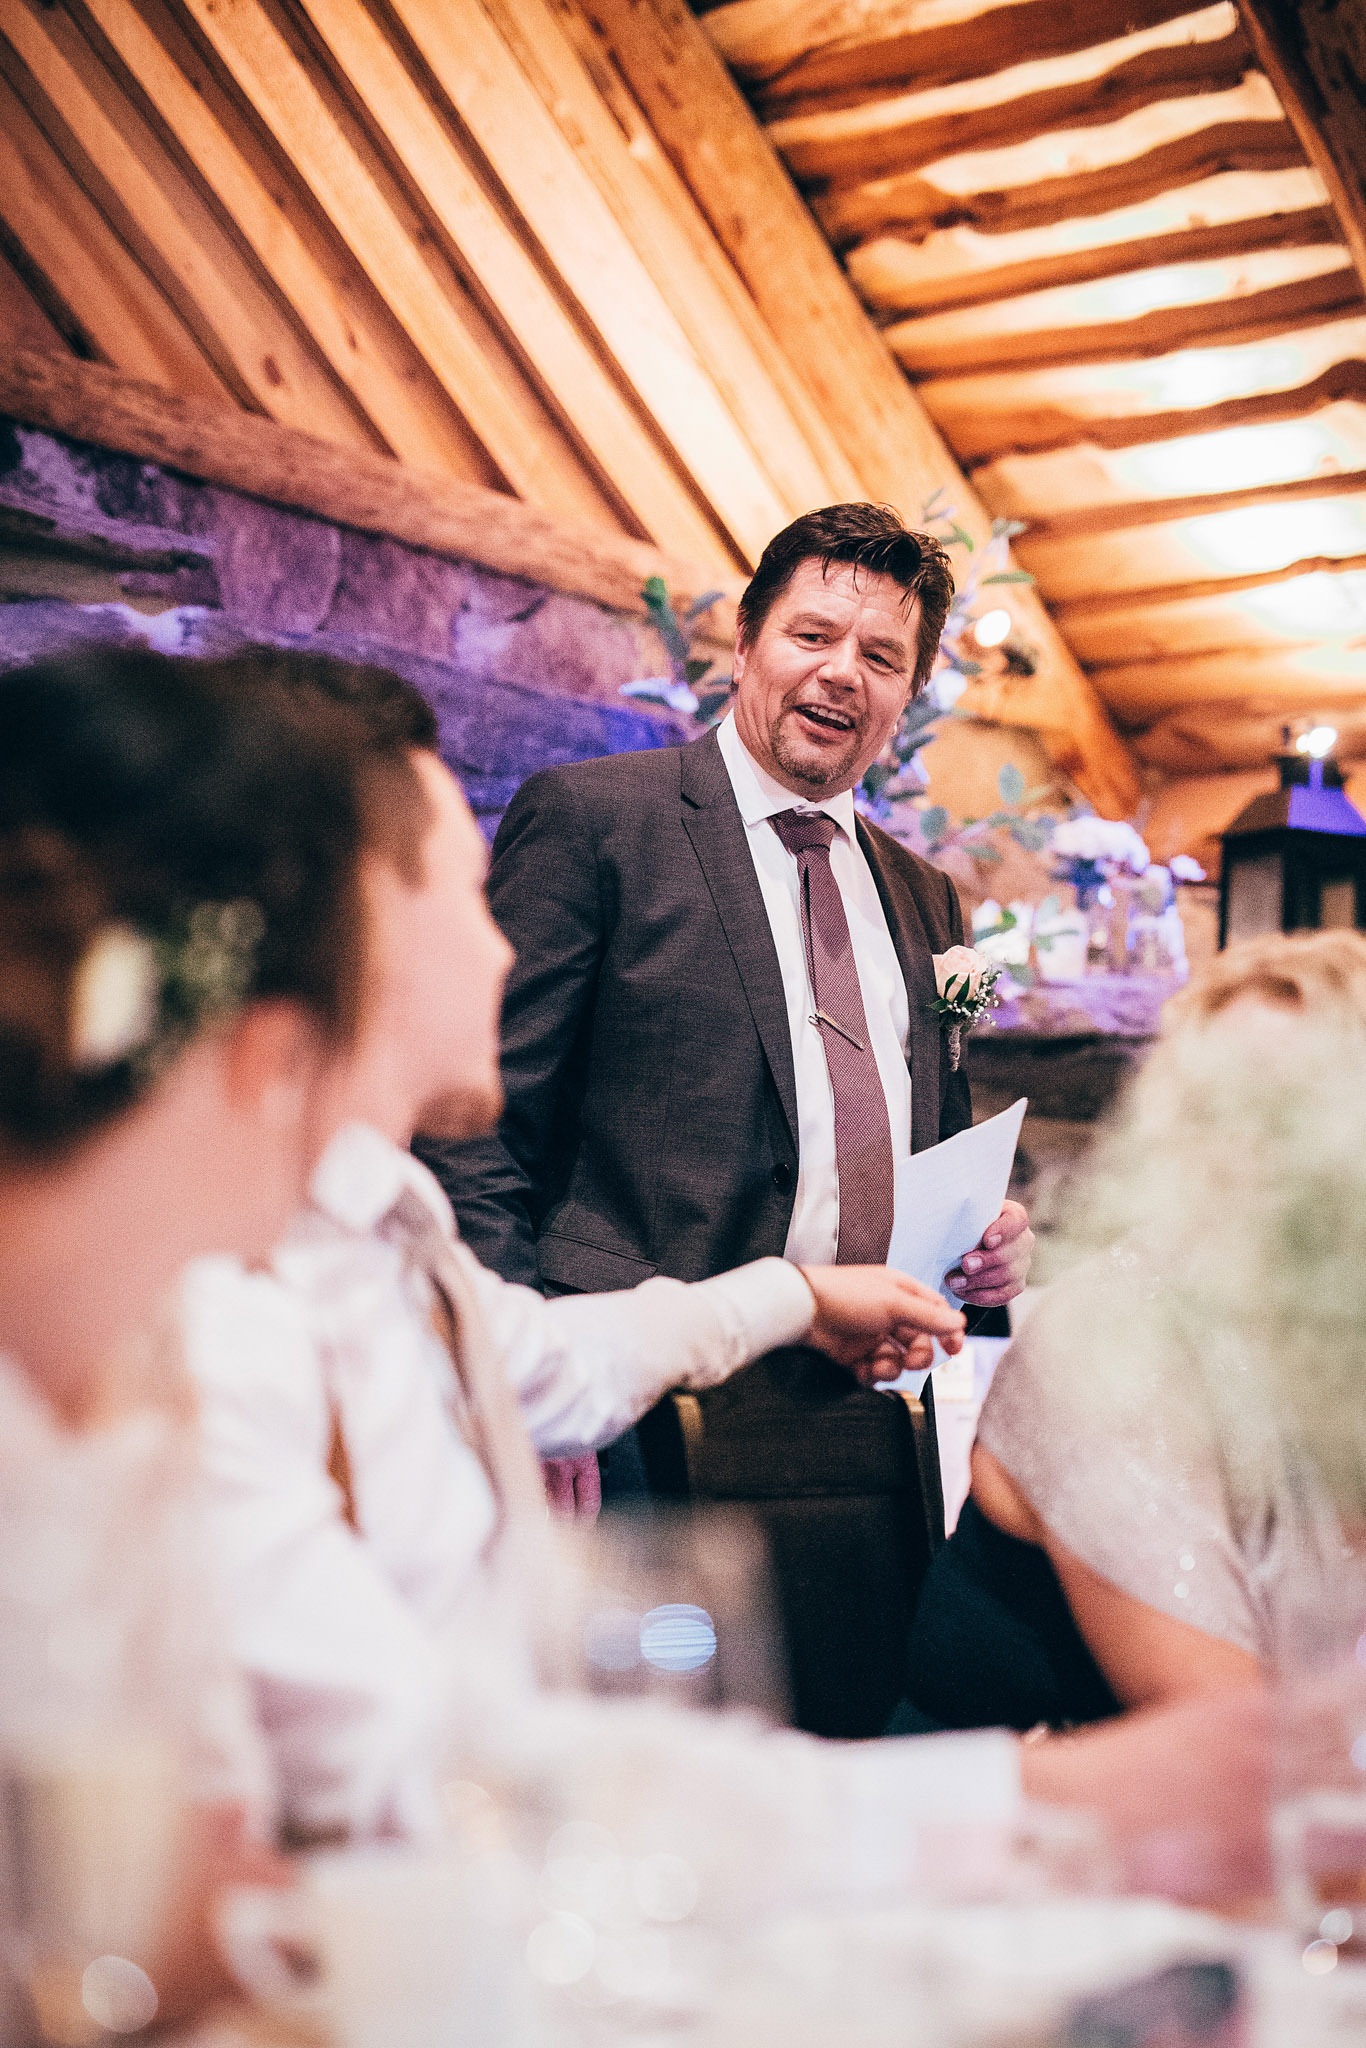 Norway+wedding+photographer+elopement+pre+wedding+Casey+Arneson-113.jpg